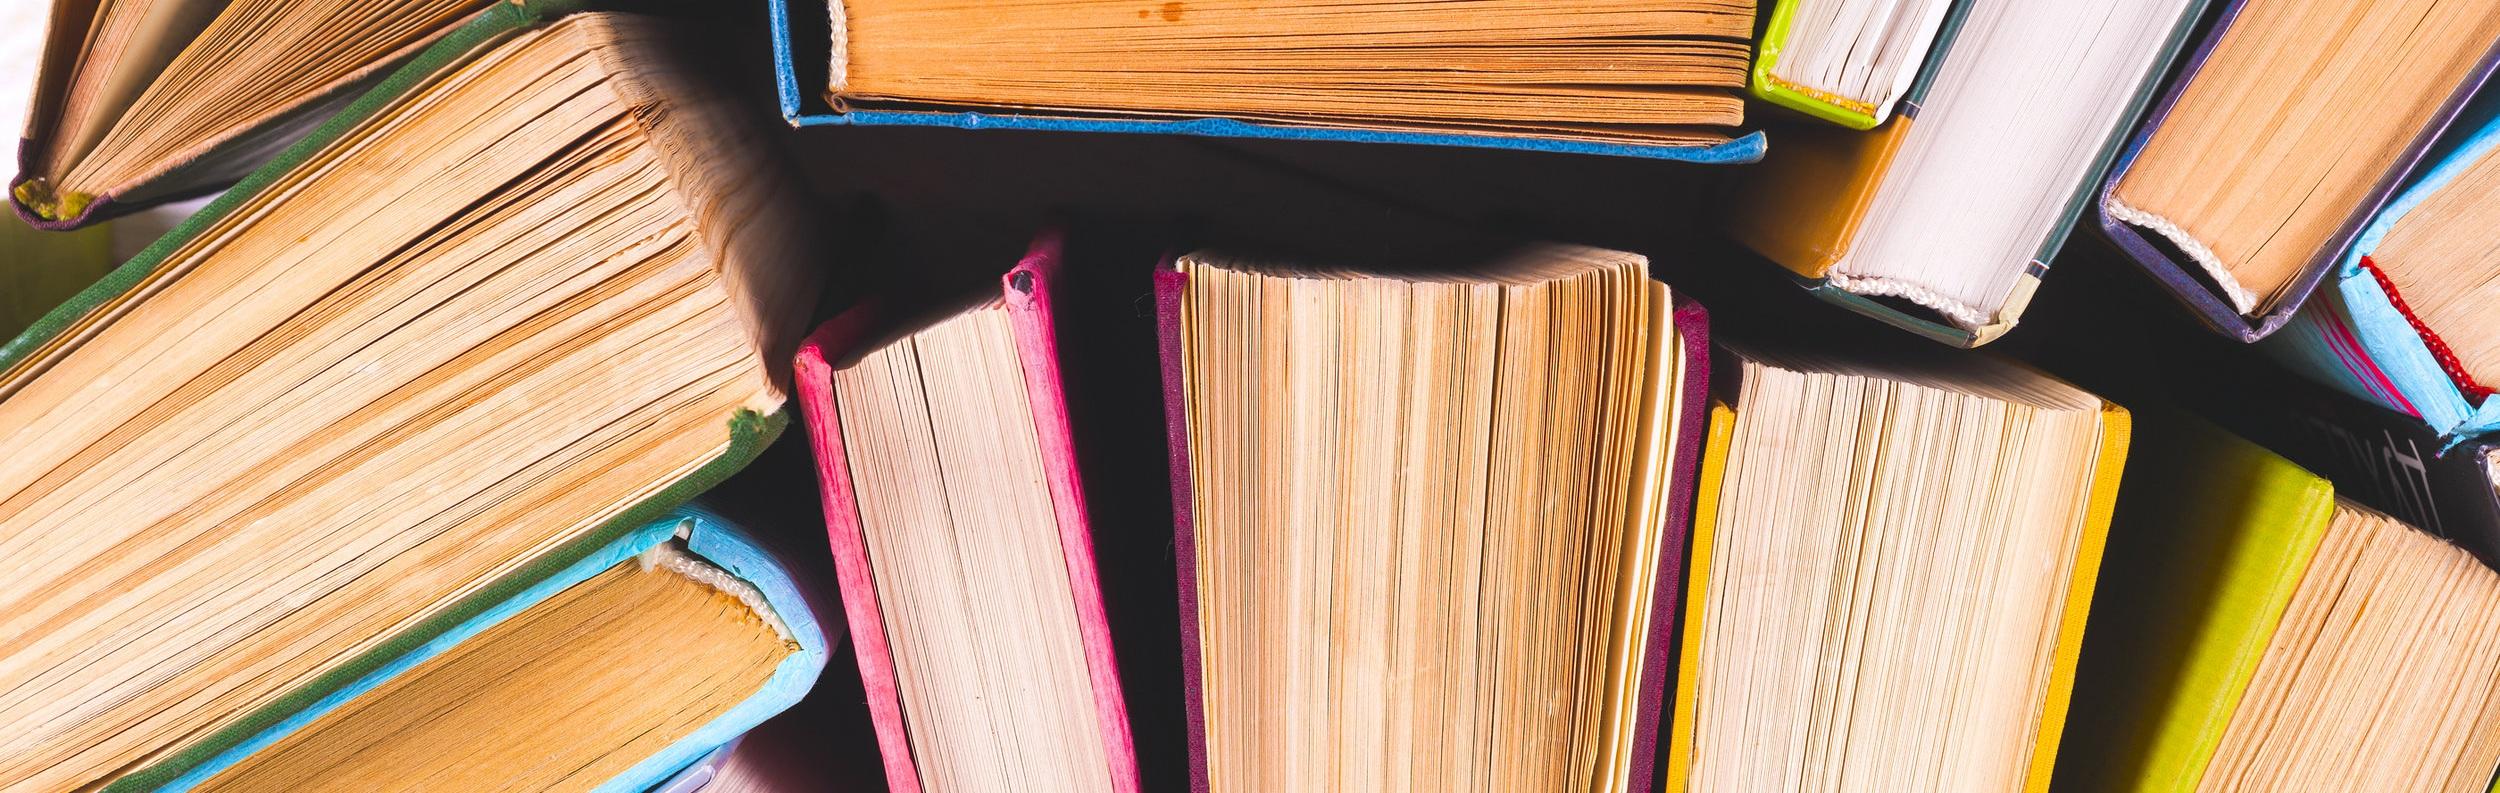 bigstock-Open-Book-Hardback-Books-On-B-228239119-1.jpg